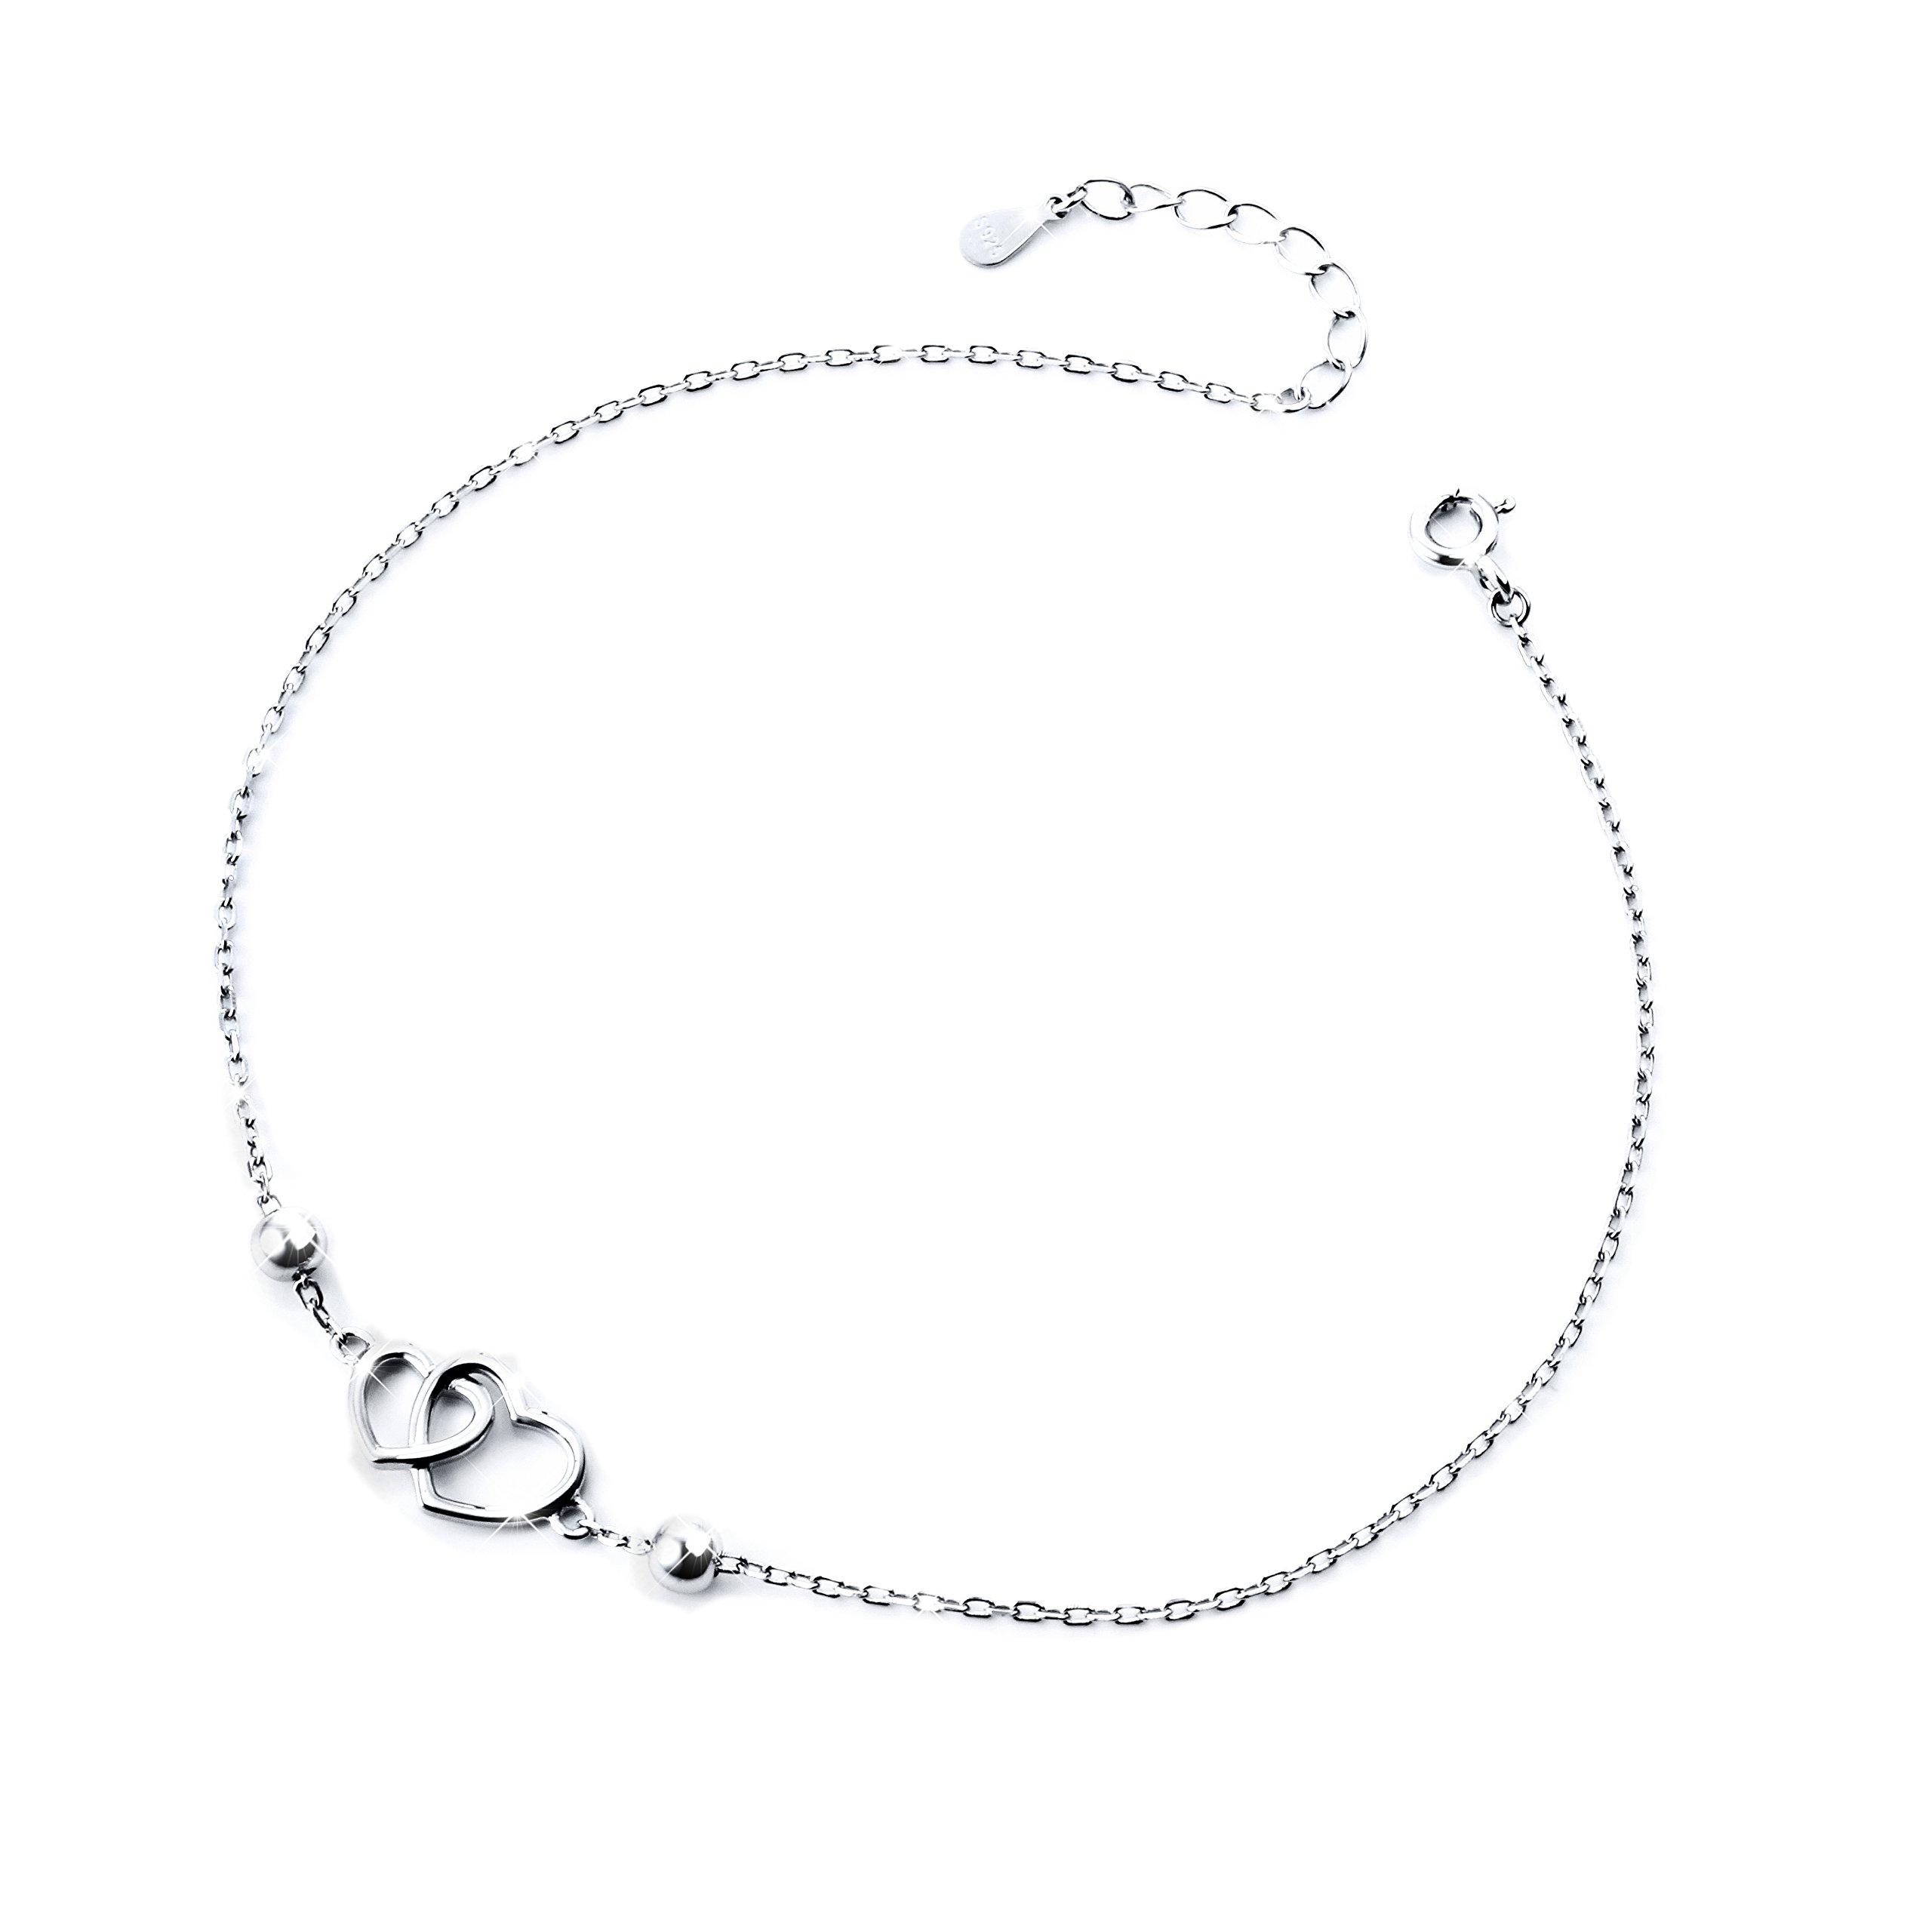 DAOCHONG Heart Anklet for Women S925 Sterling Silver Adjustable Foot Ankle Bracelet by DAOCHONG